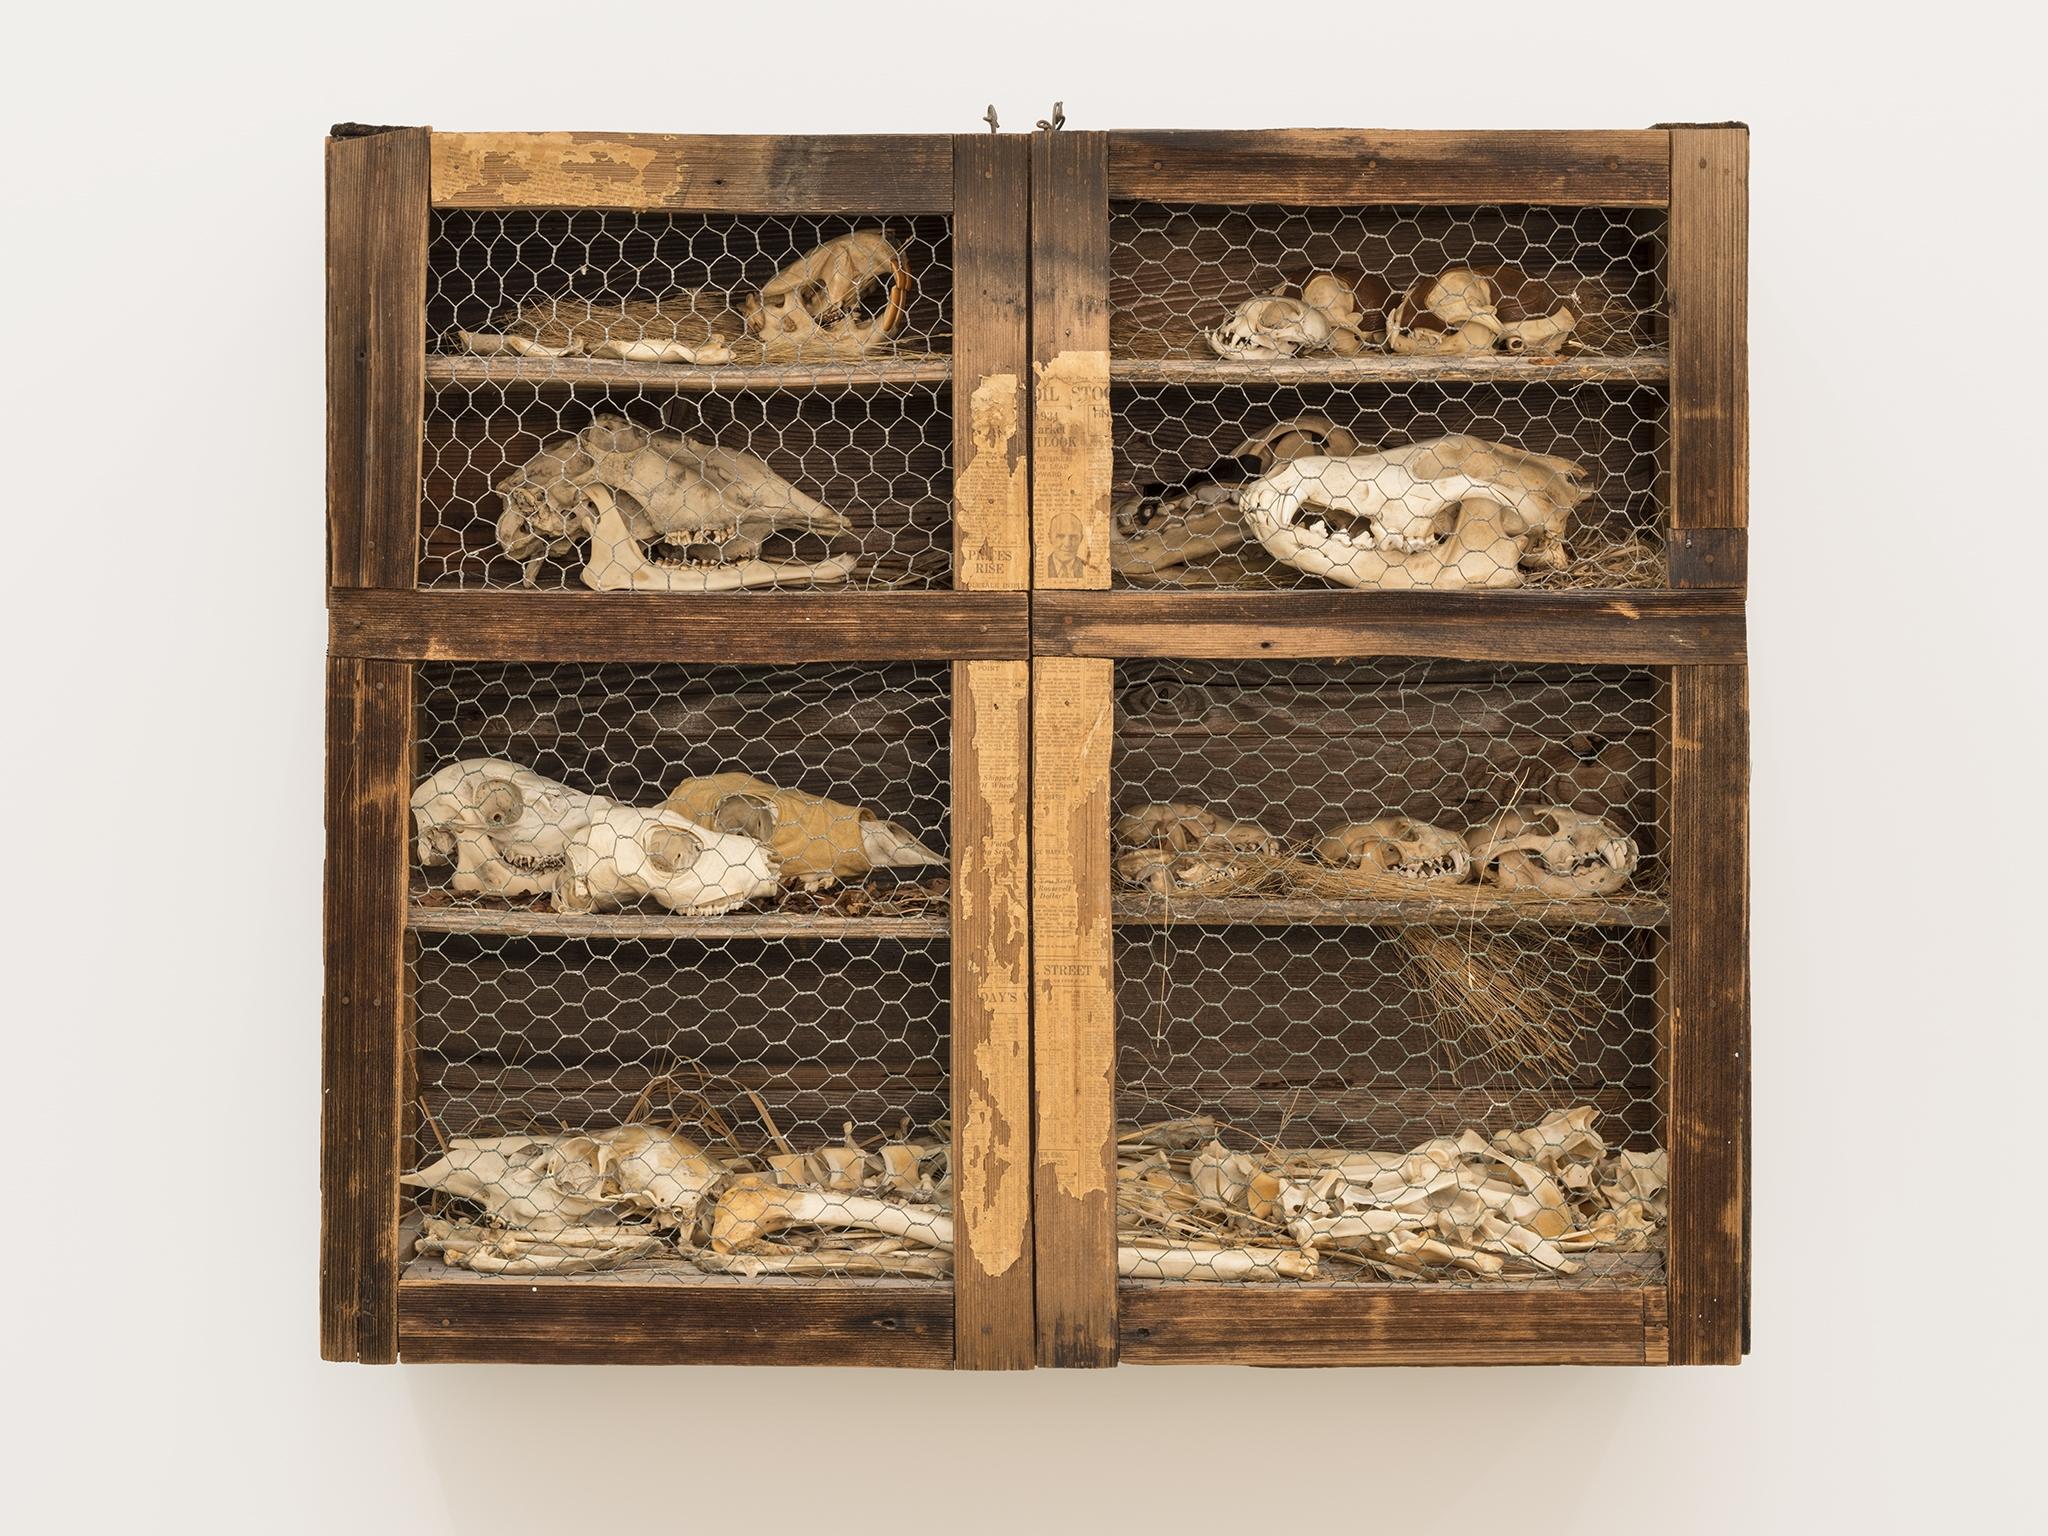 Liz Magor, The Hutch, 1976, natural materials, wood, bones, 33 x 38 x 15 in. (84 x 97 x 38 cm) by